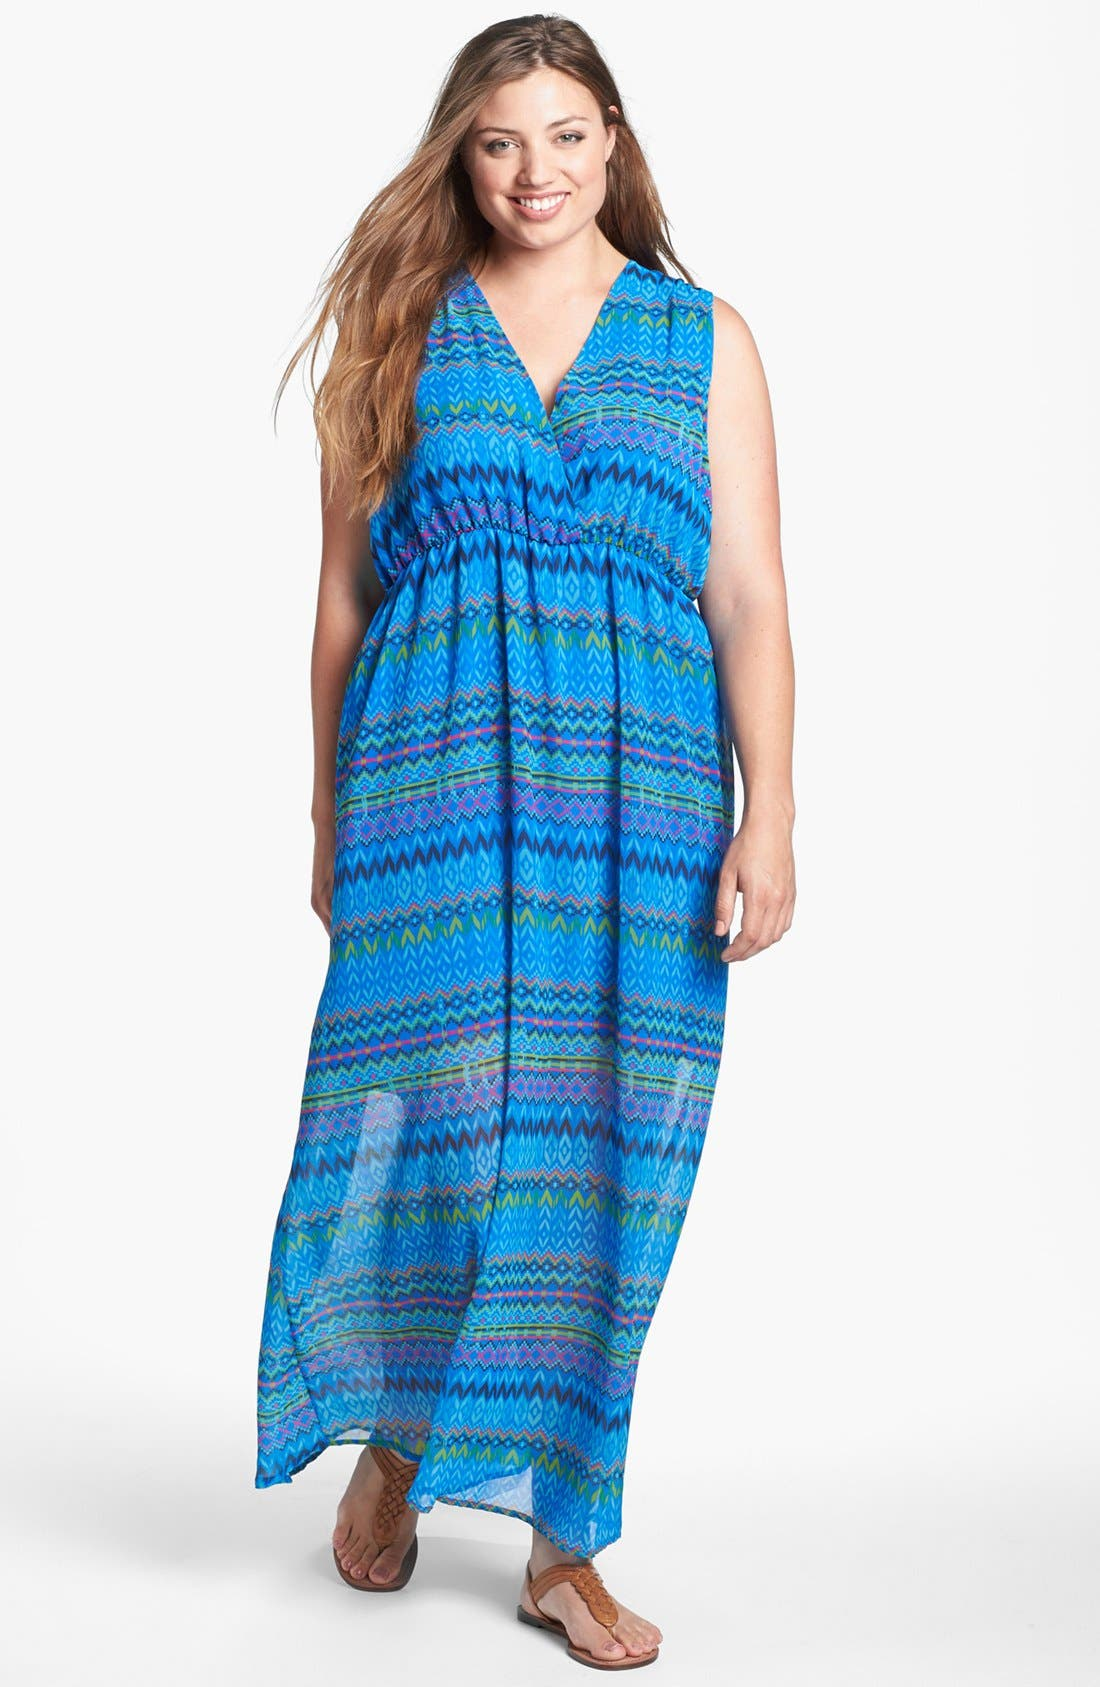 Main Image - Sweet Pea by Stacy Frati Print Chiffon Maxi Dress (Plus Size)